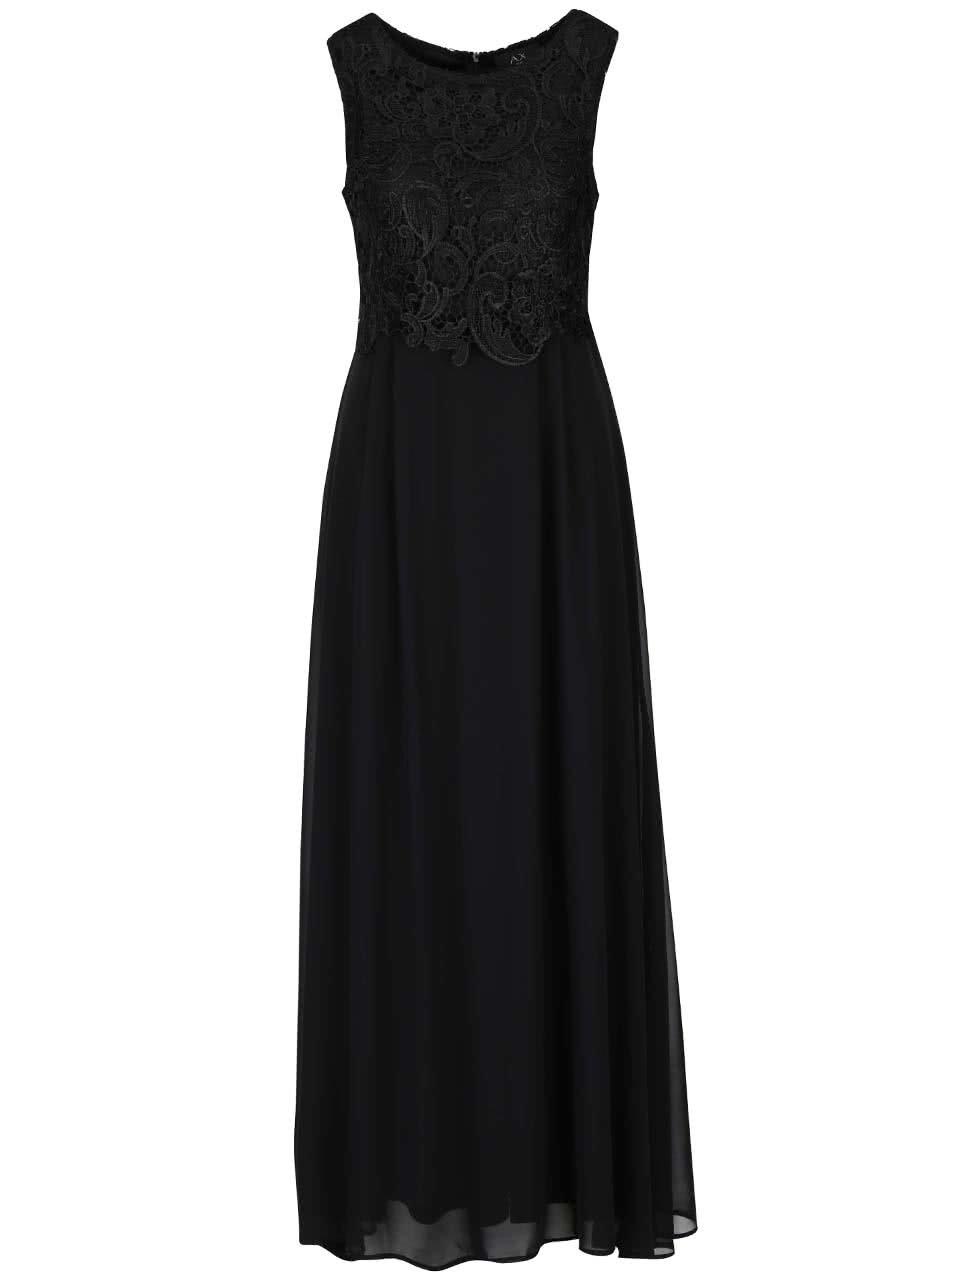 Černé dlouhé šaty s krajkou AX Paris